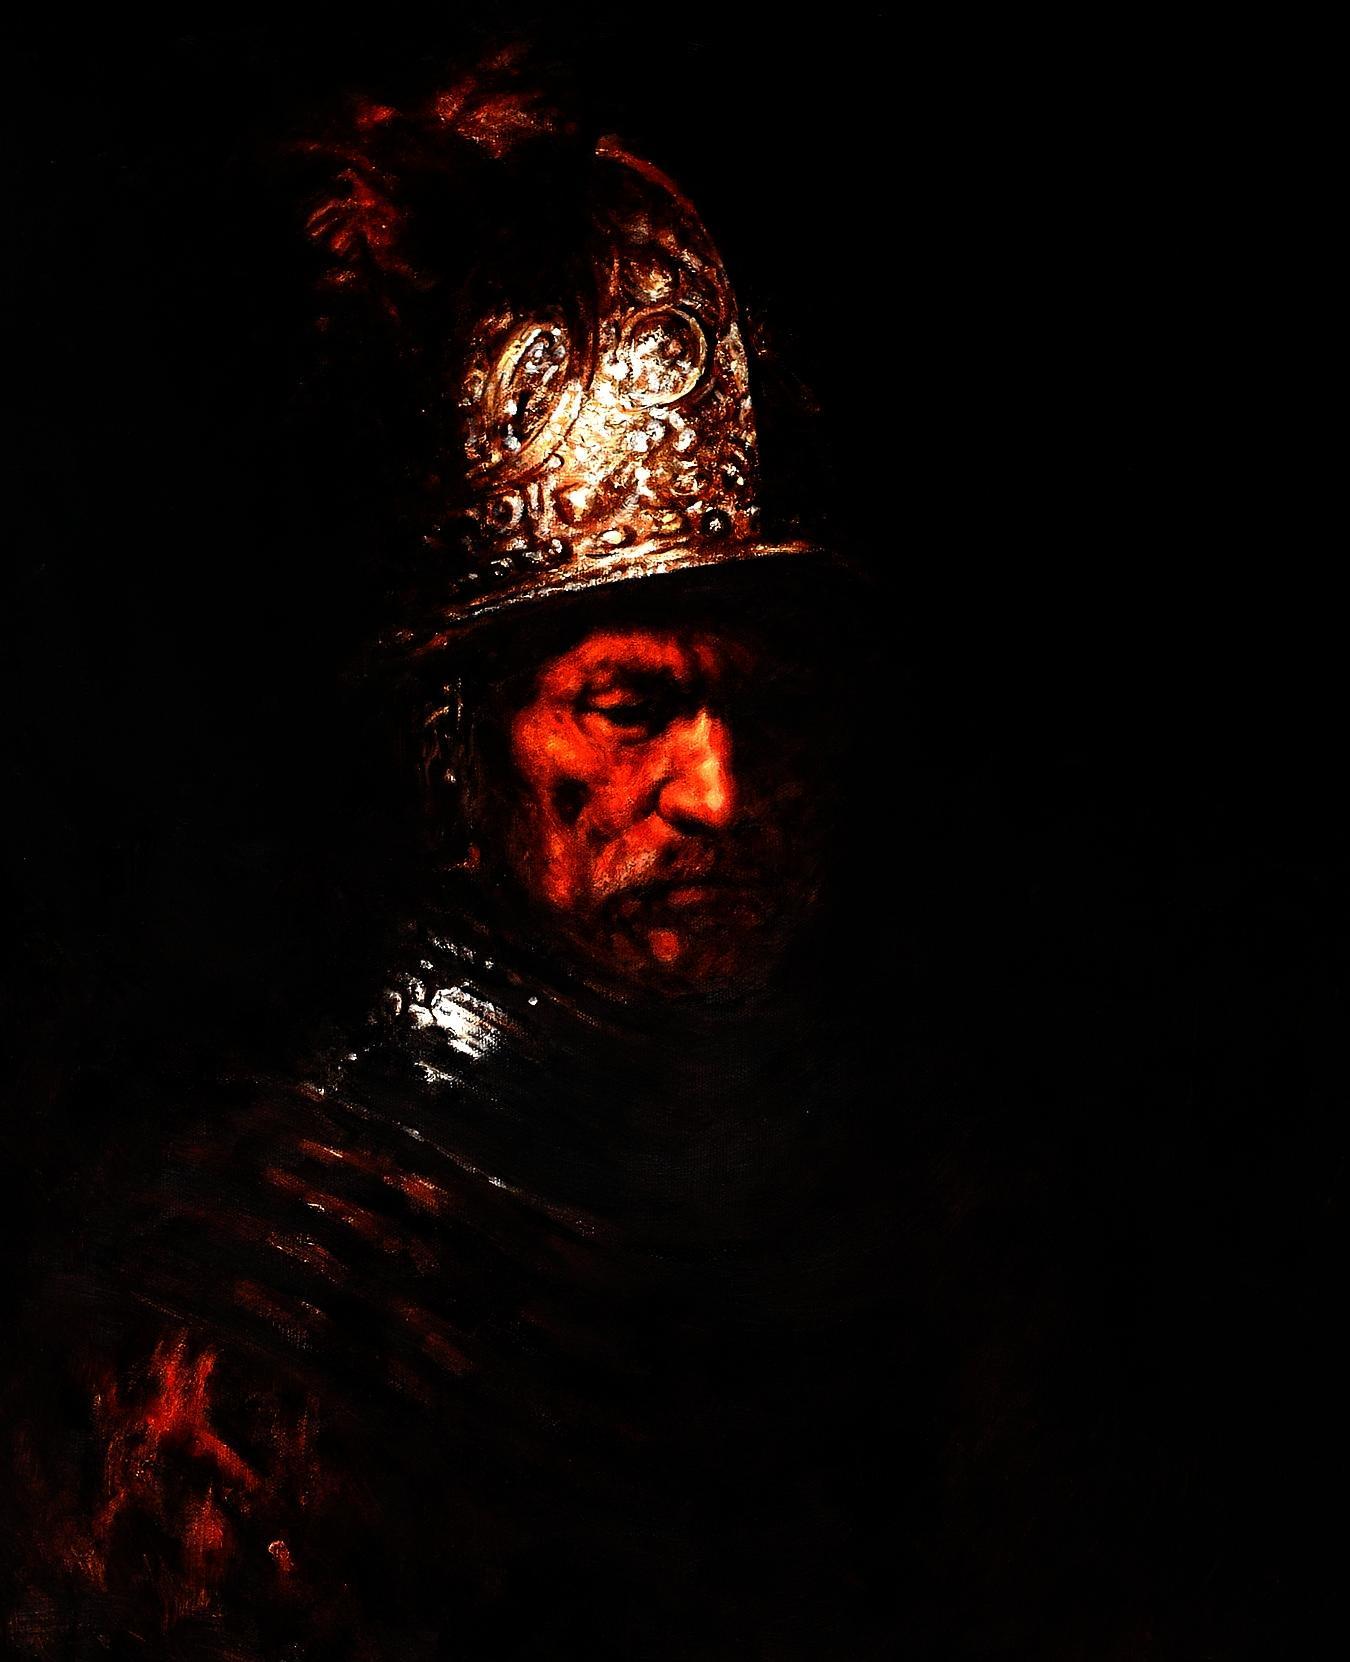 Rembrandt Mann Mit Goldhelm C93171 50x60cm Edles ölgemälde